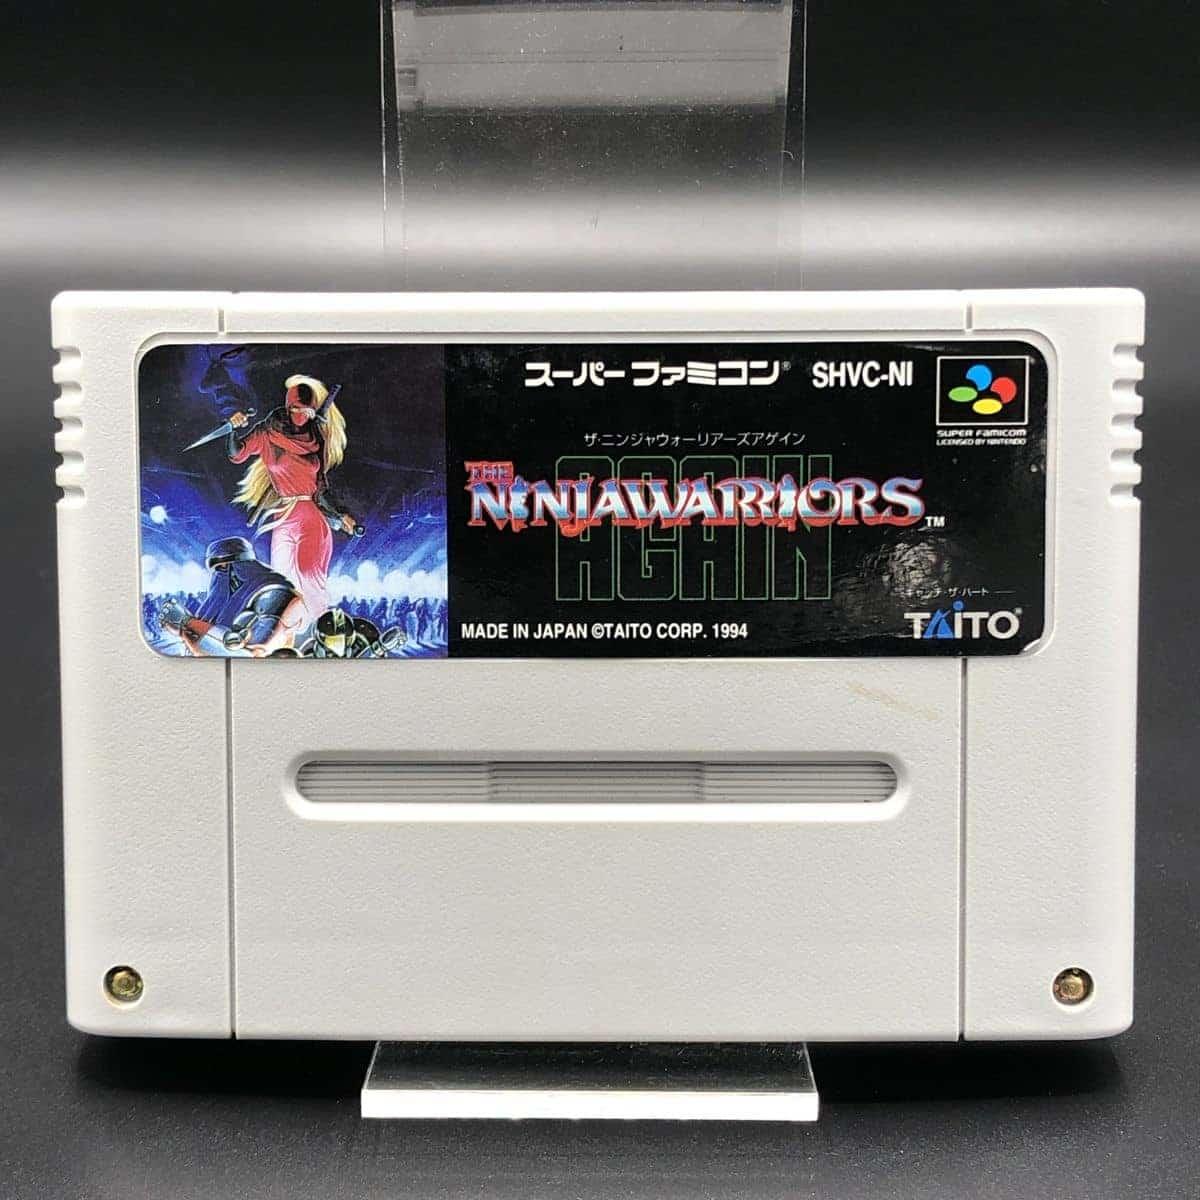 SNES Ninja Warriors - The New Generation (Modul) (Sehr gut) Super Nintendo